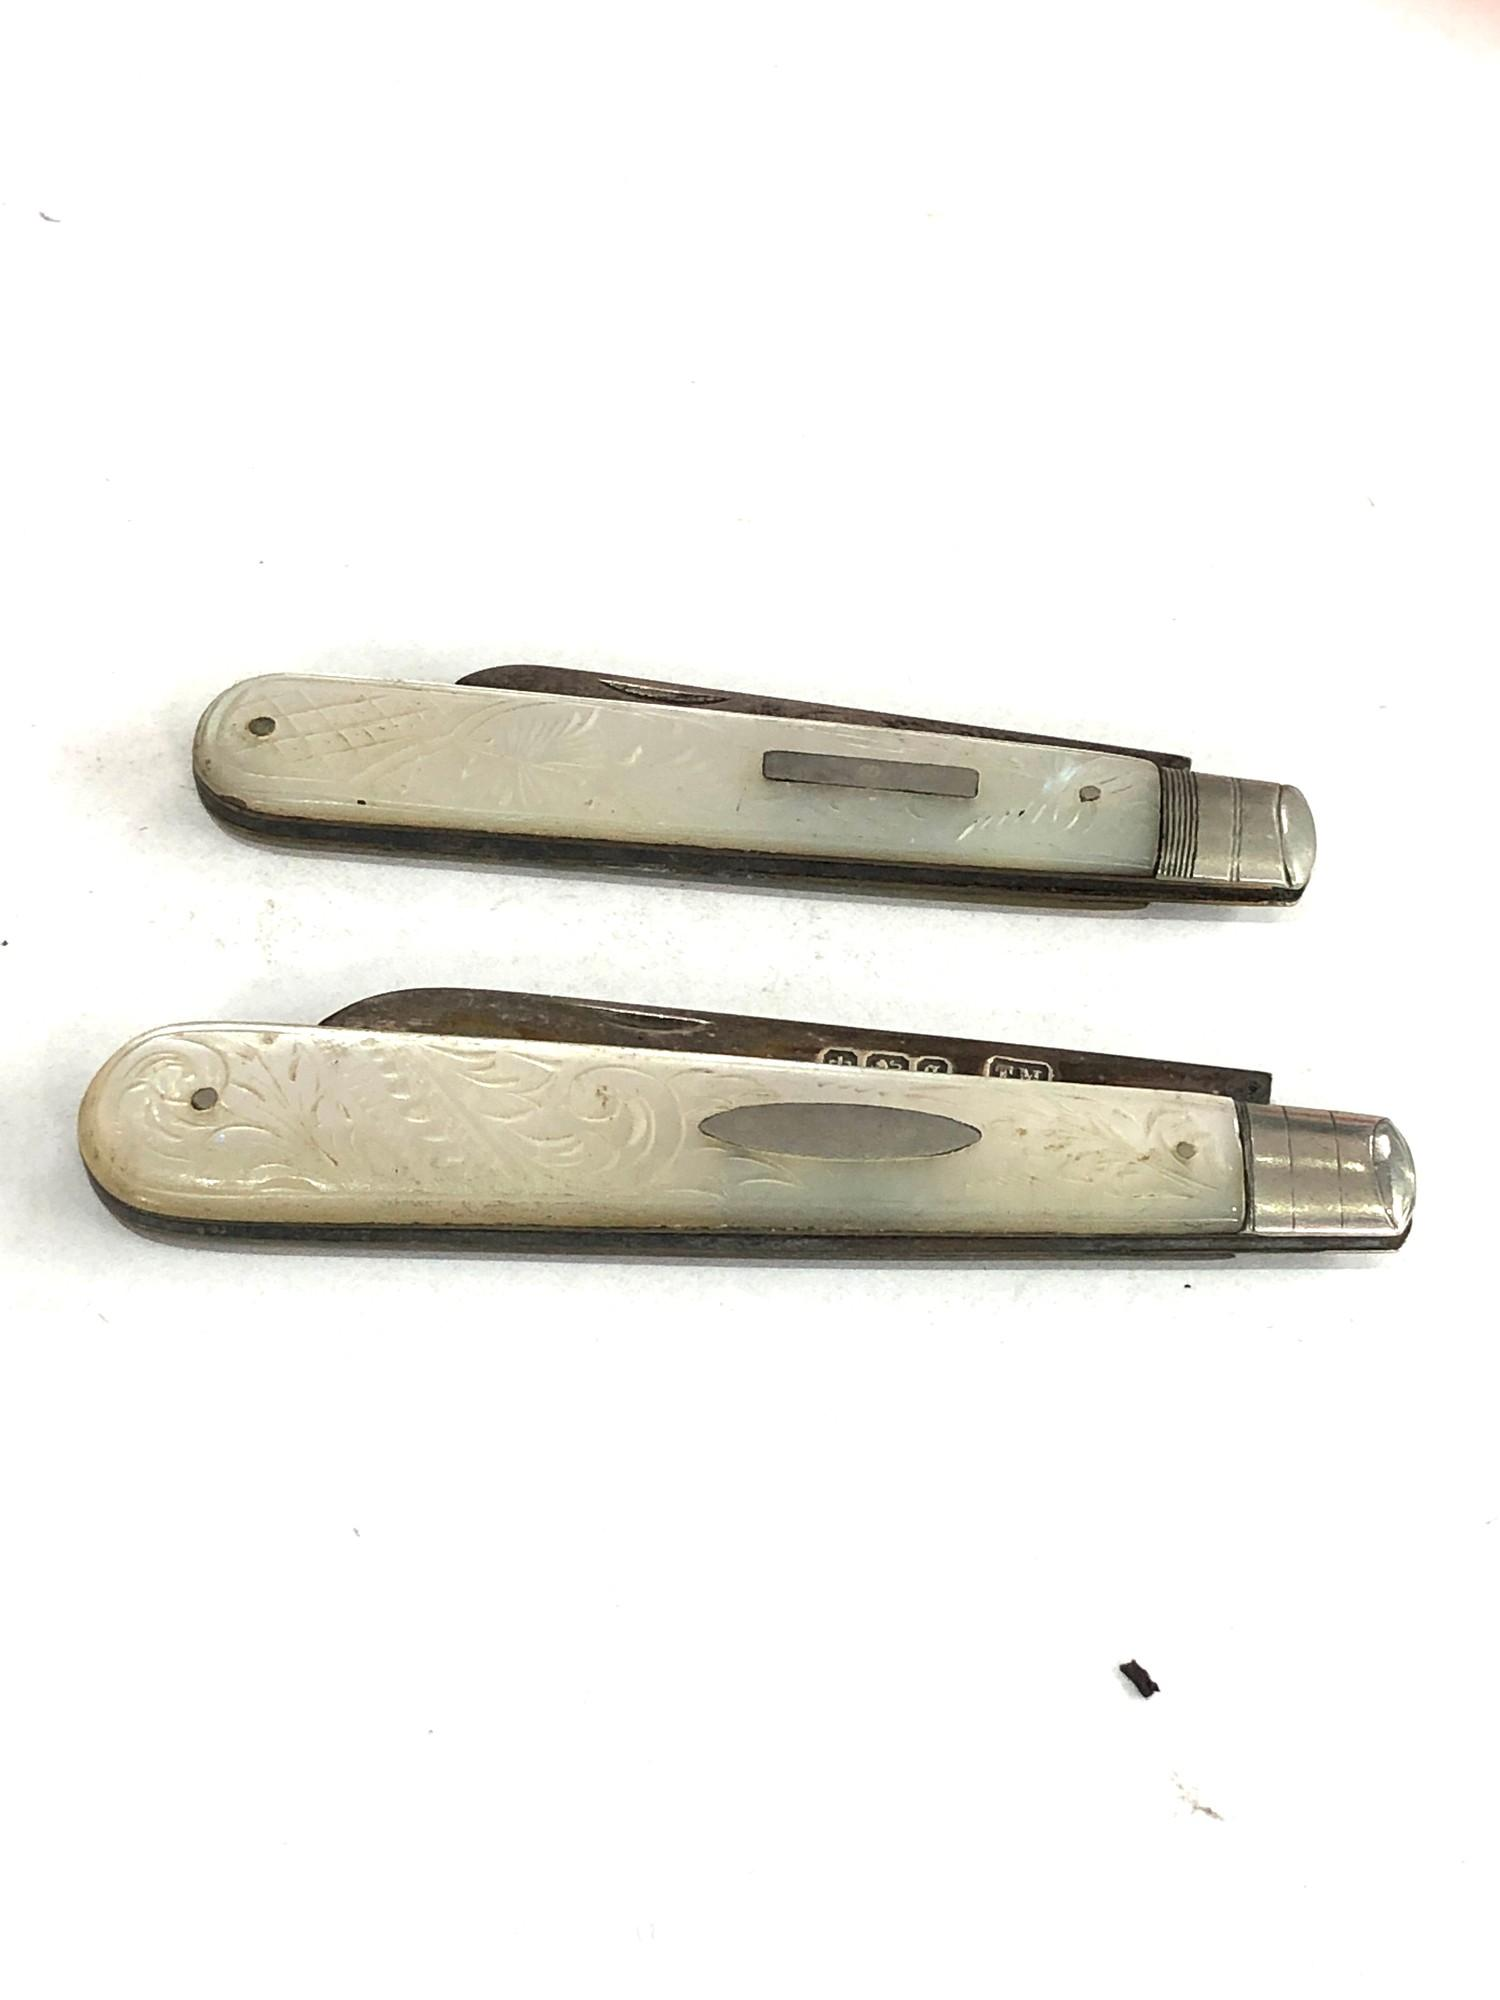 2 antique silver fruit knives